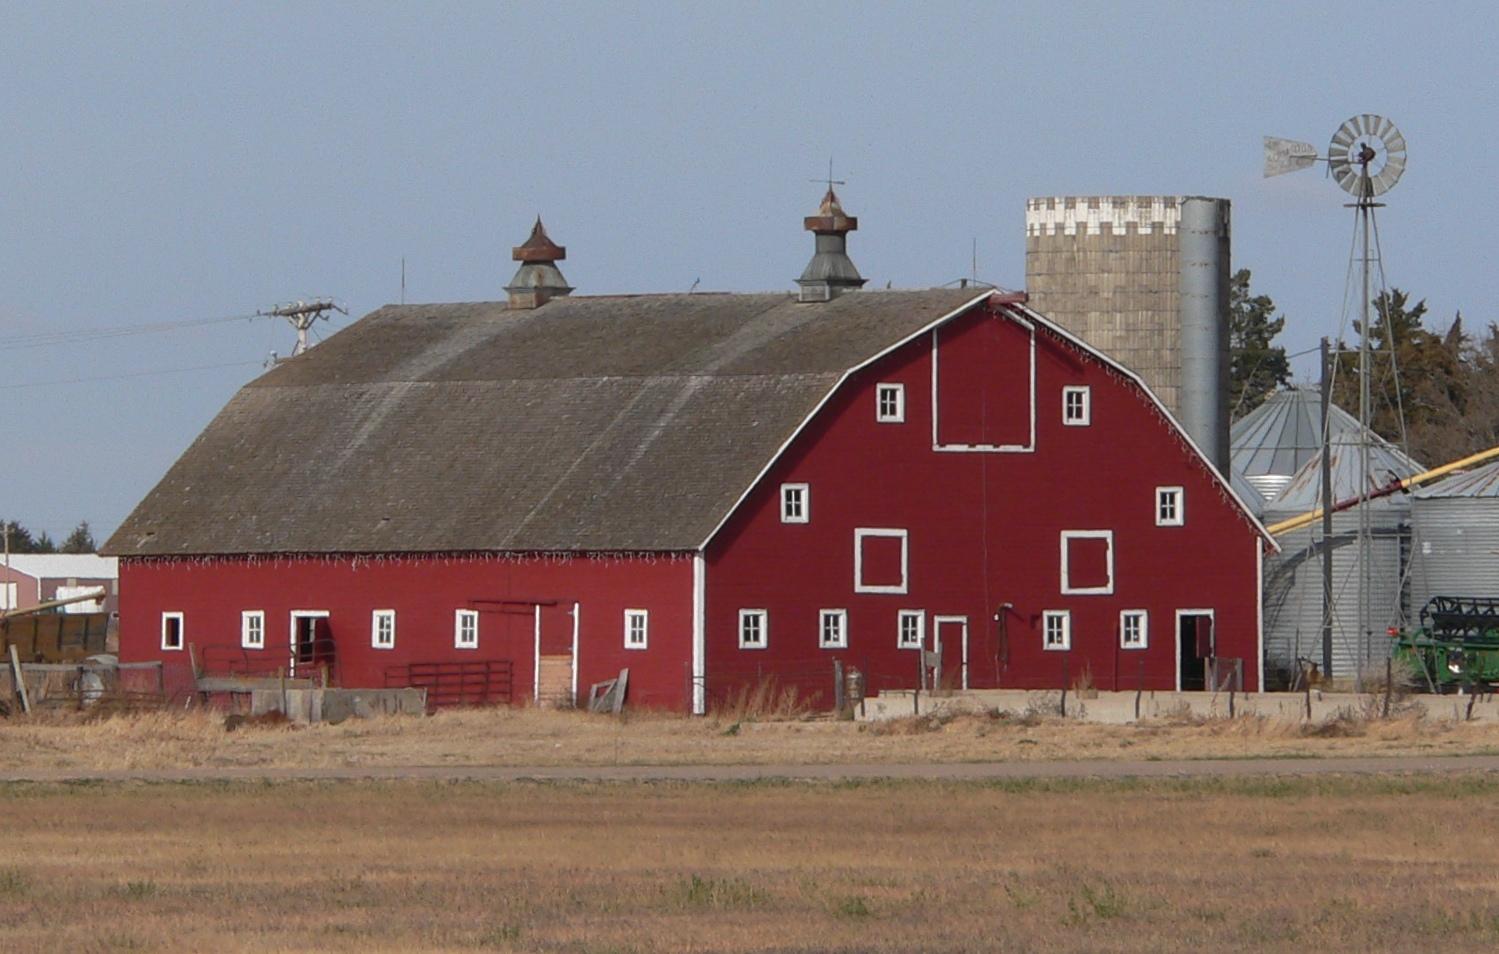 Farm Barn file:nelson farm (merrick county, nebraska) barn from se 1